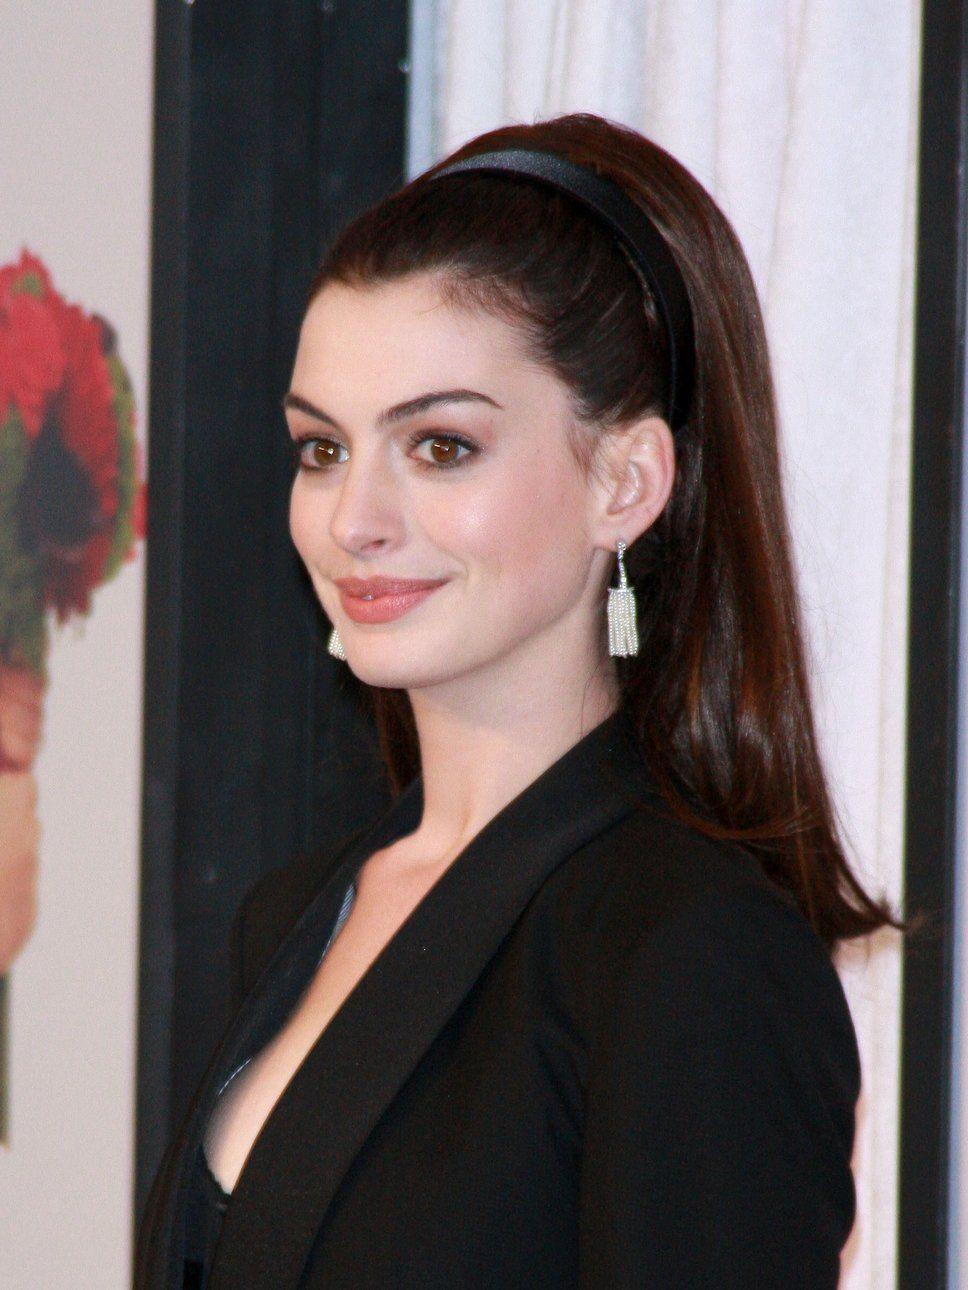 ponytail hairstyles | Anne Hathaway ponytail | Hair Ideas ...